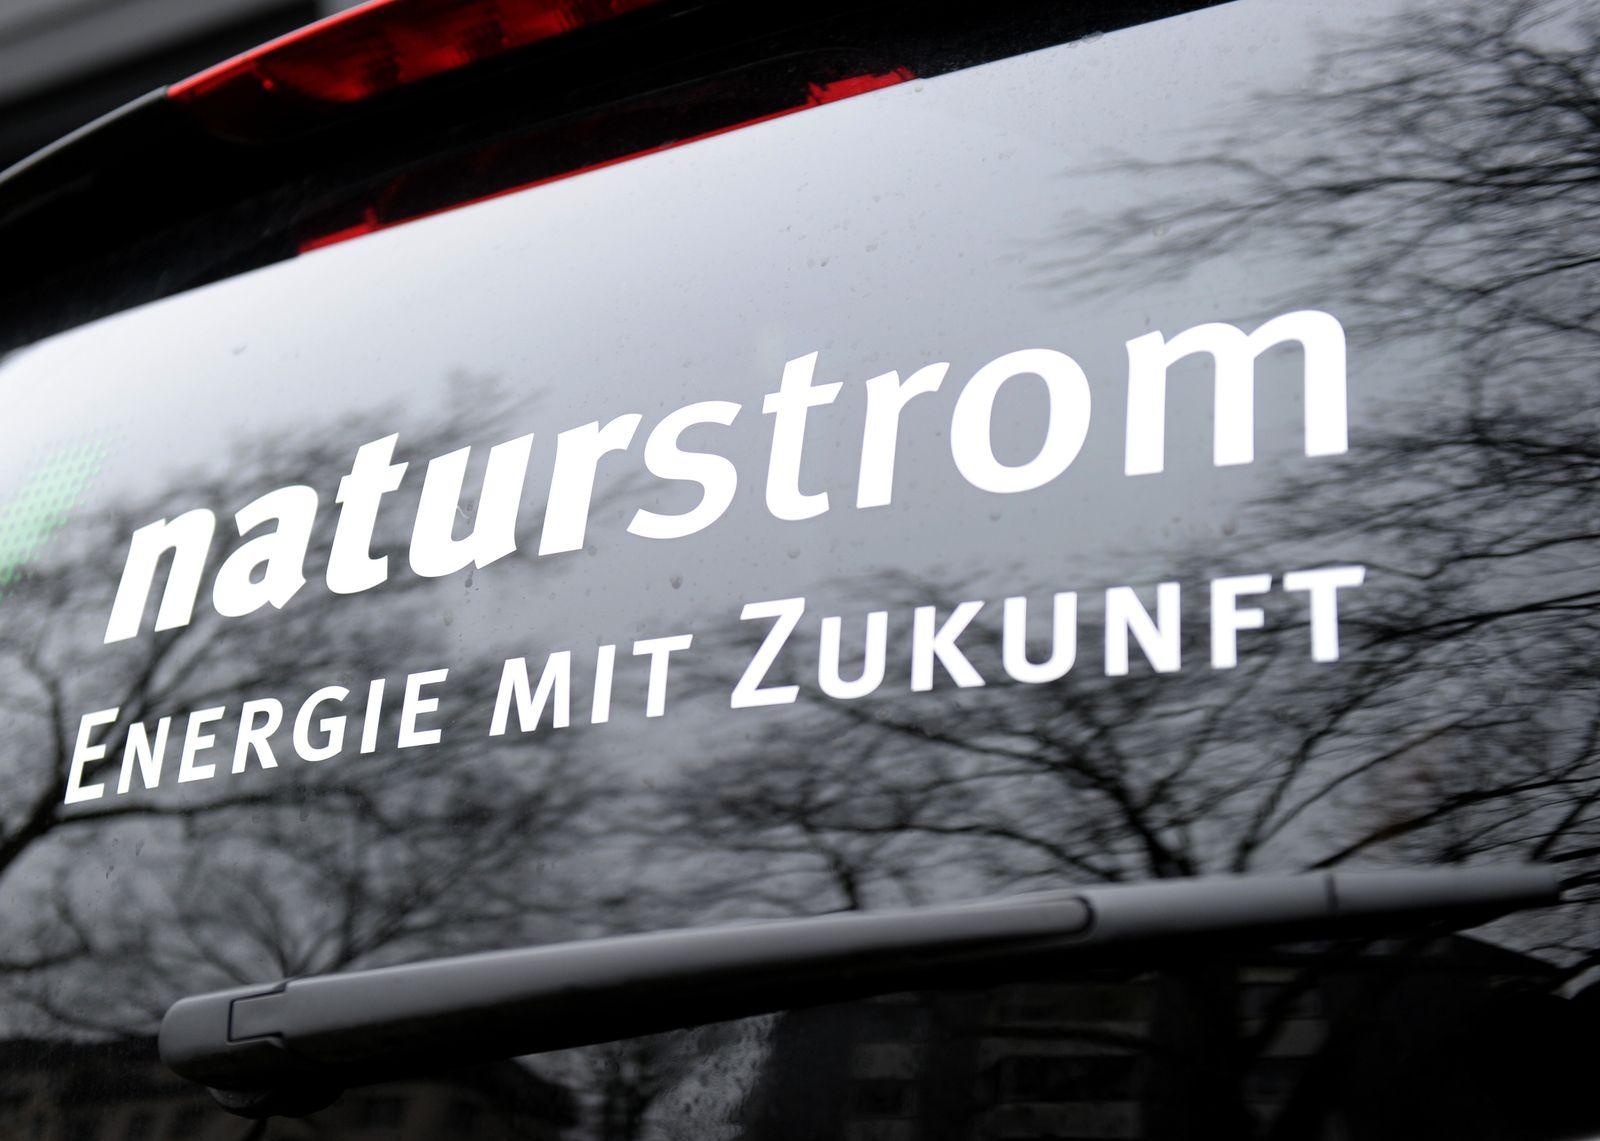 Ökostrom - Naturstrom